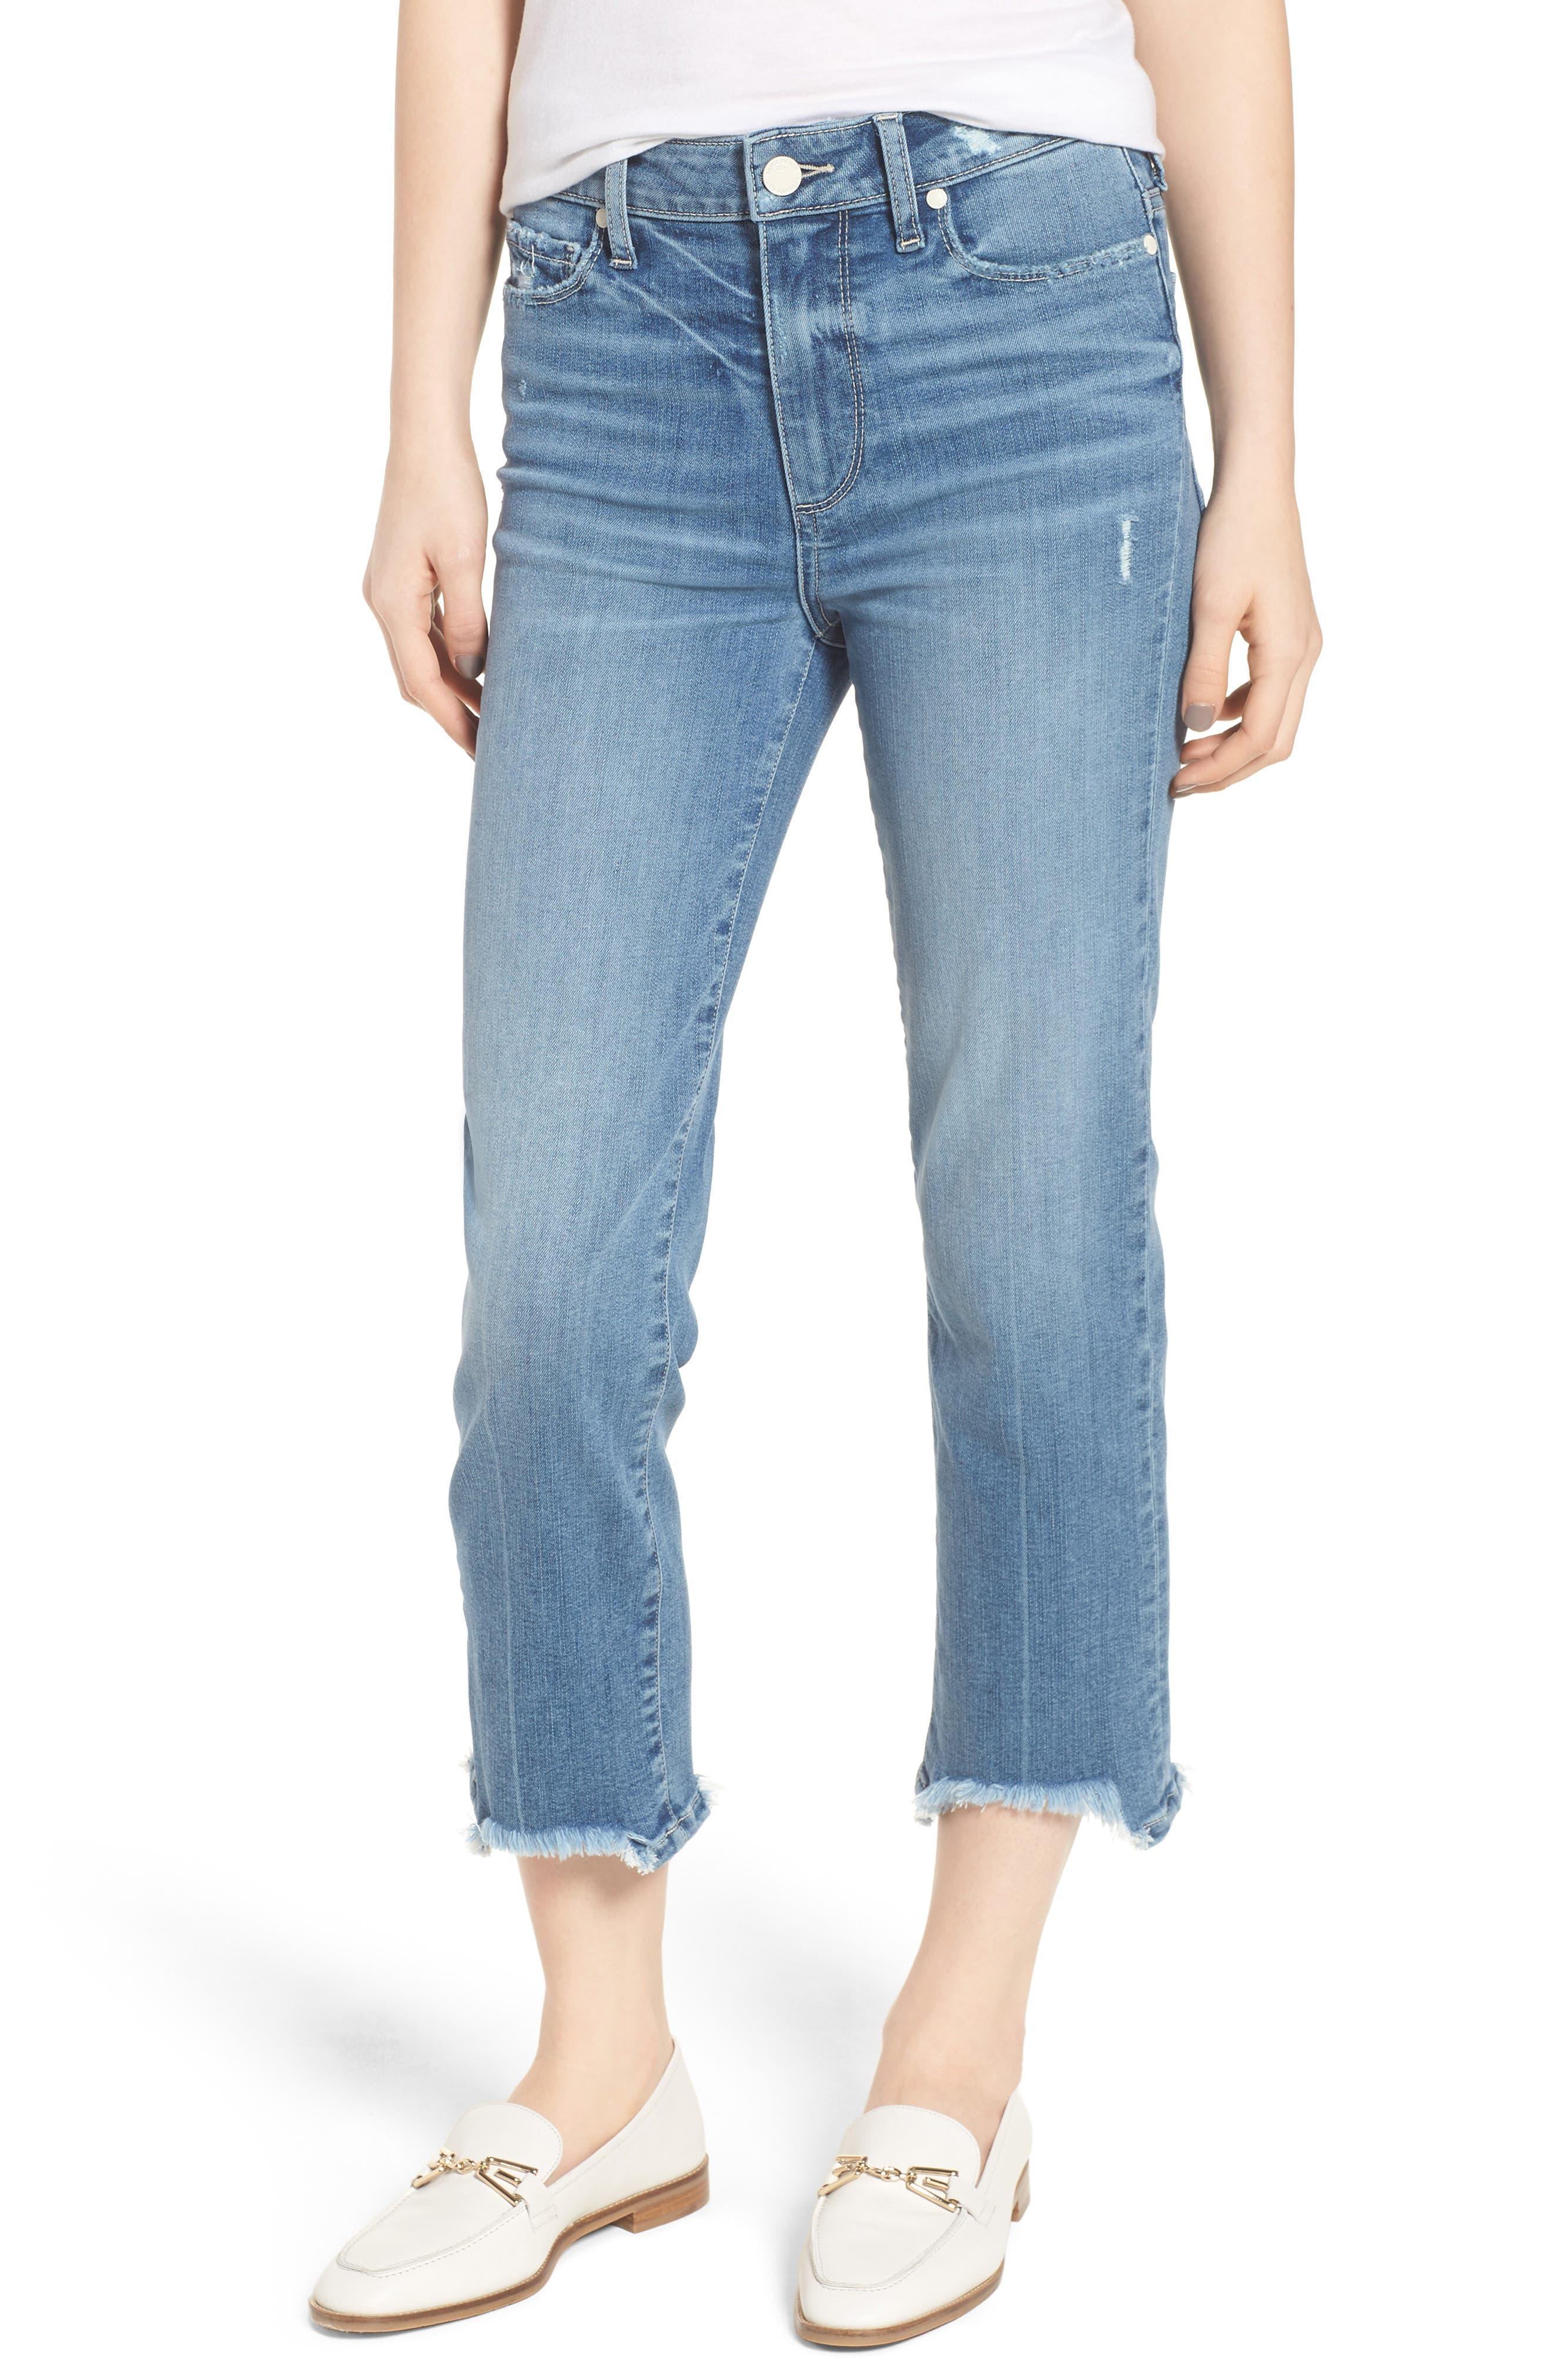 Transcend Vintage - Hoxton High Waist Crop Straight Leg Jeans,                         Main,                         color, Zahara